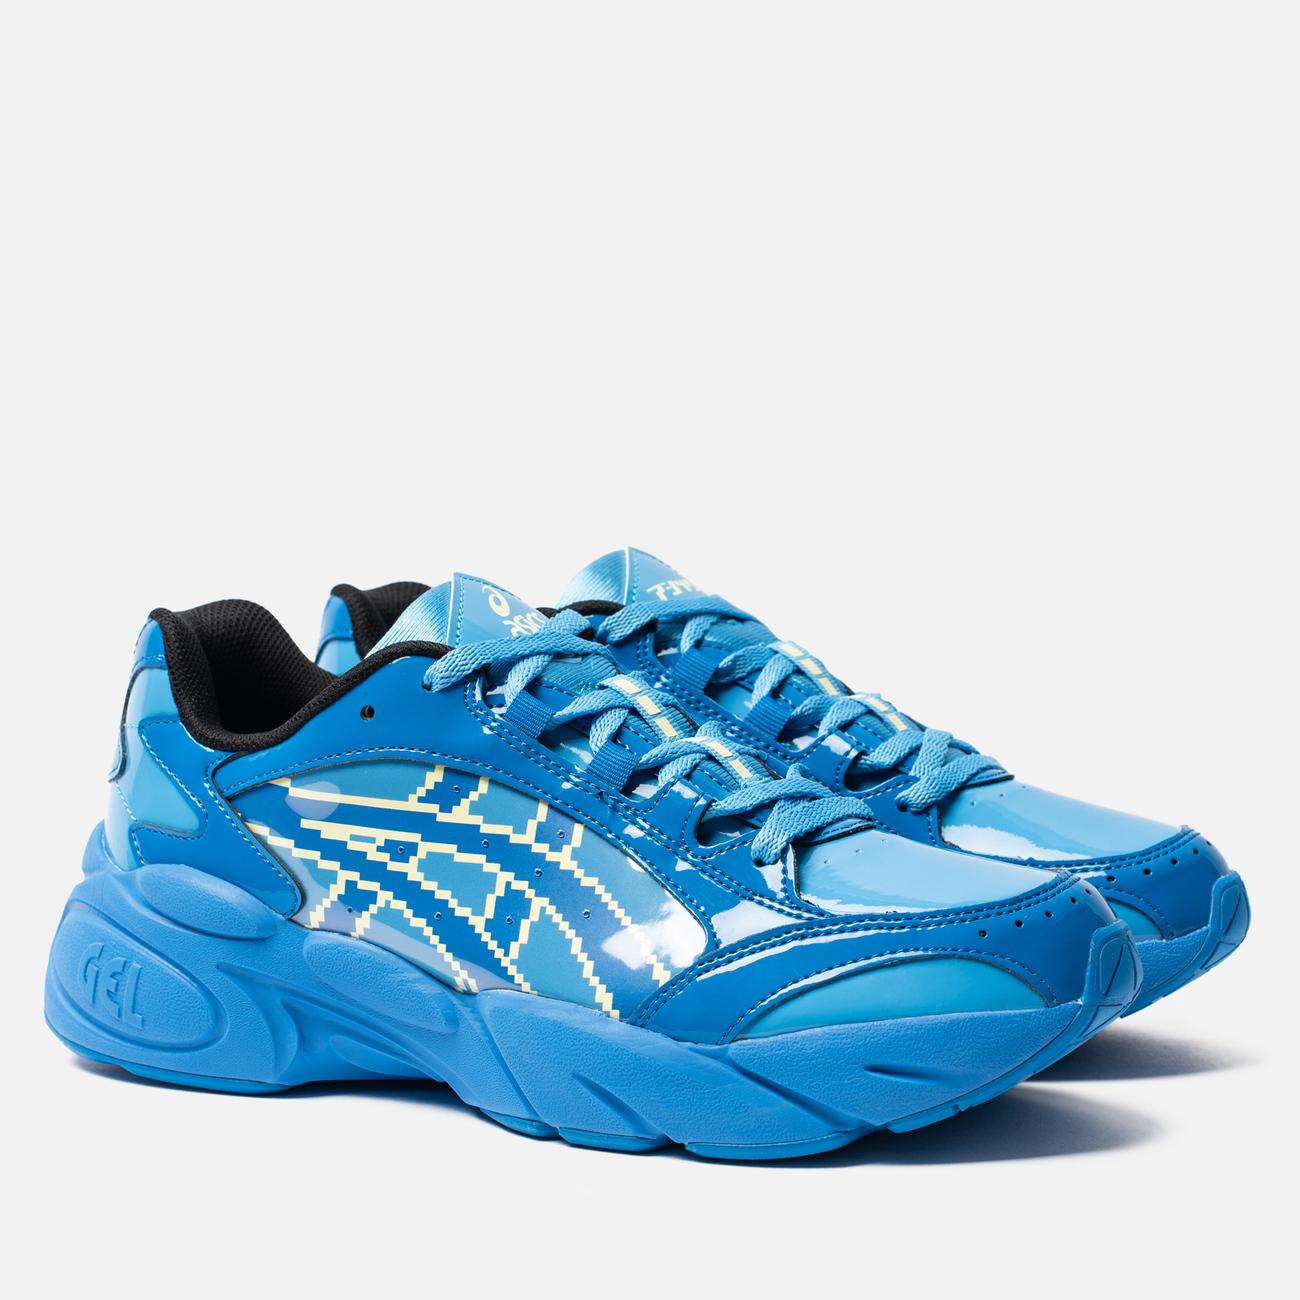 Мужские кроссовки ASICS x Megaman Gel-BND Electric Blue/Electric Blue